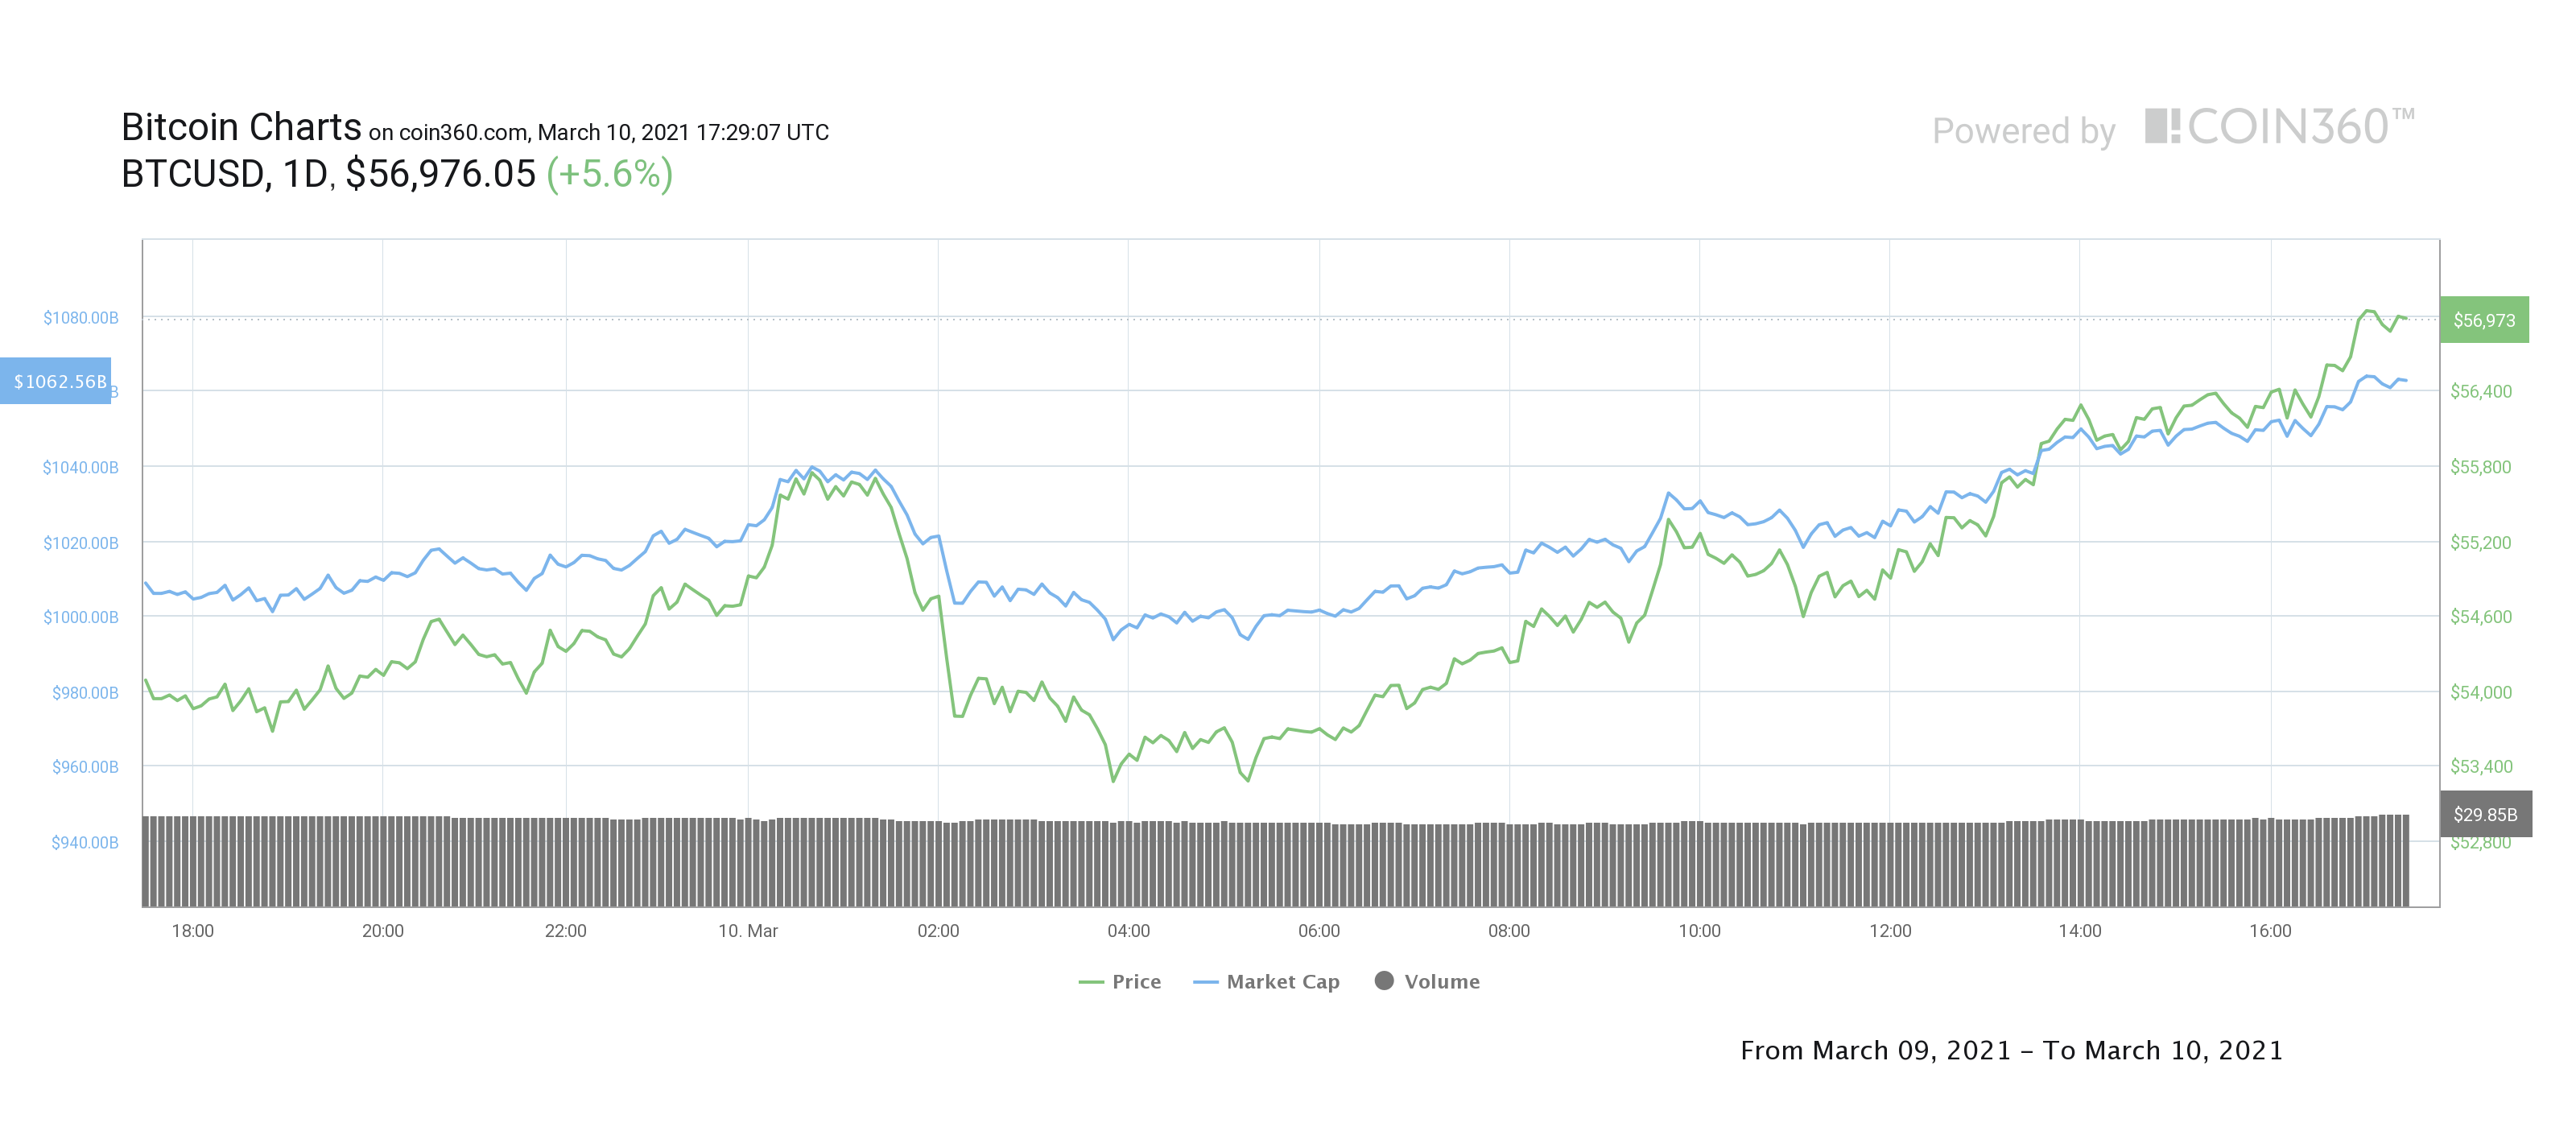 Bitcoin bulls stampede toward $60,000 after a key BTC resistance is broken